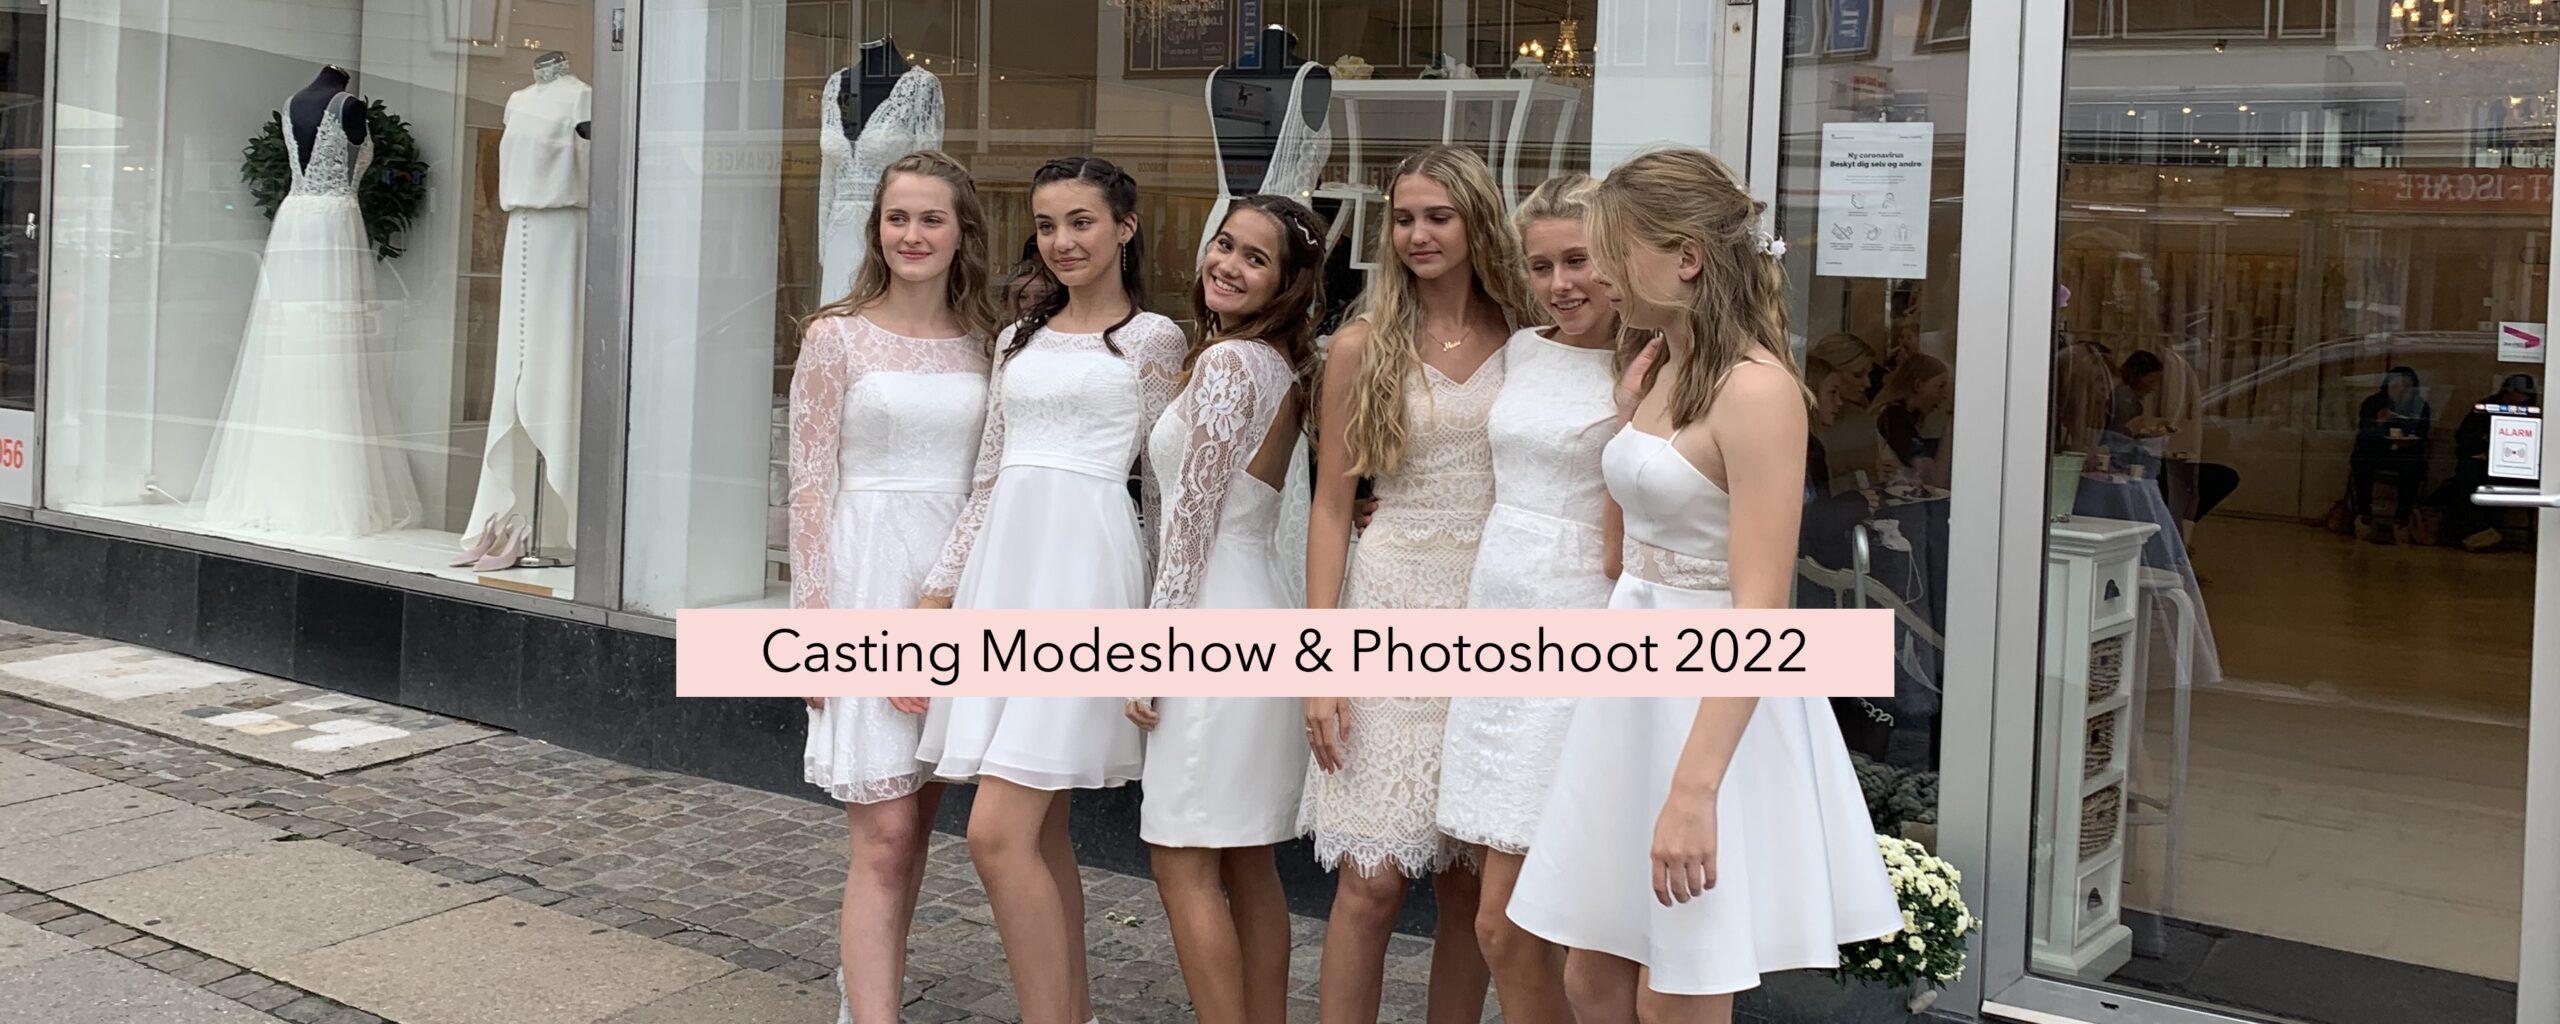 Casting 2022